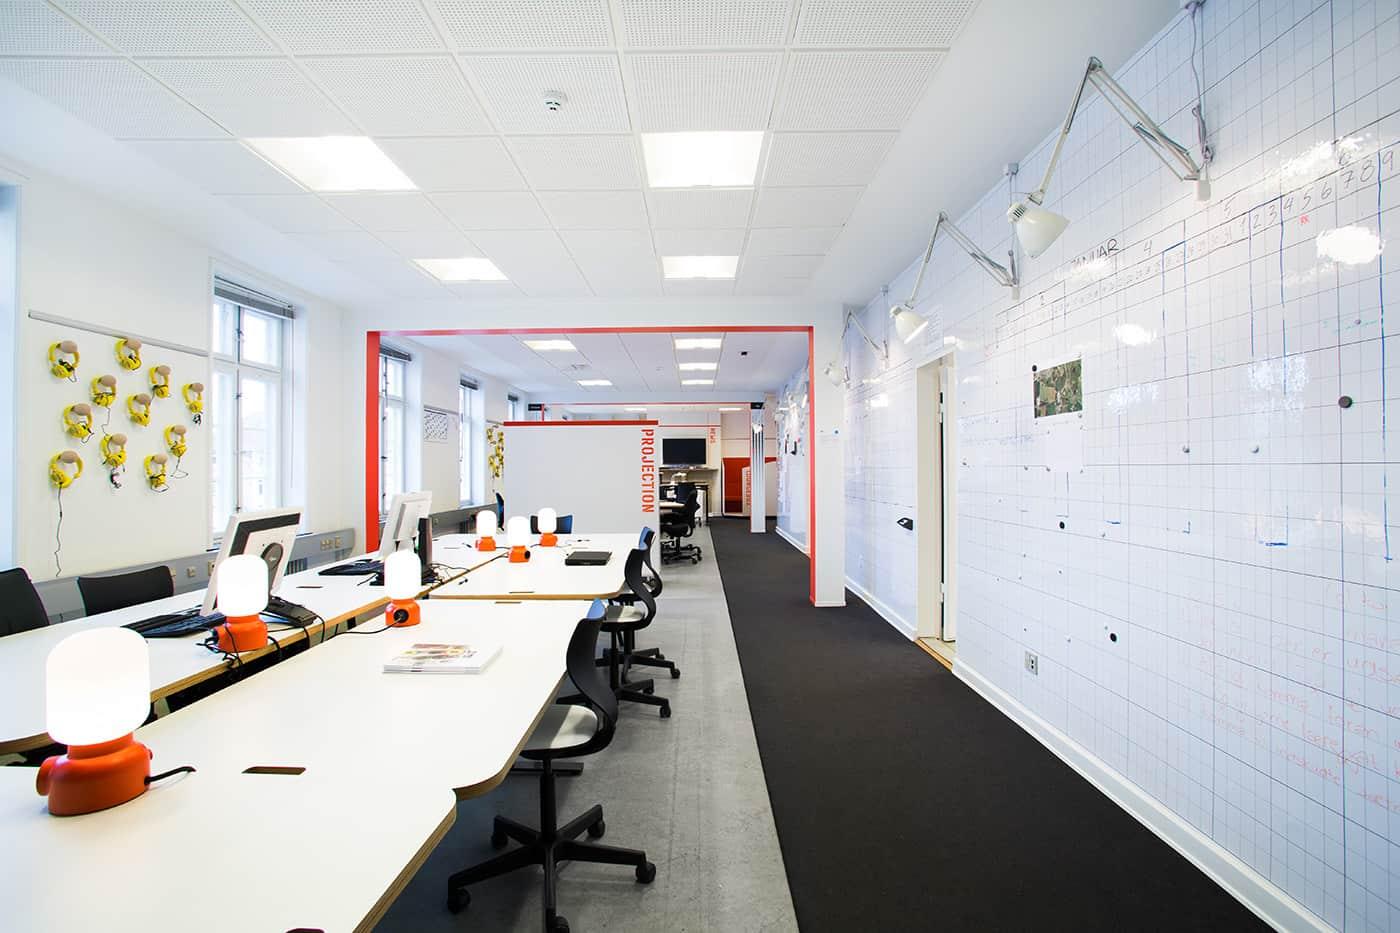 RITAarch, indretning, spaceplanning, kontorindretning, åbentkontor, specialinventar, specialdesign, Nyt hospital Nordsjælland projekthus